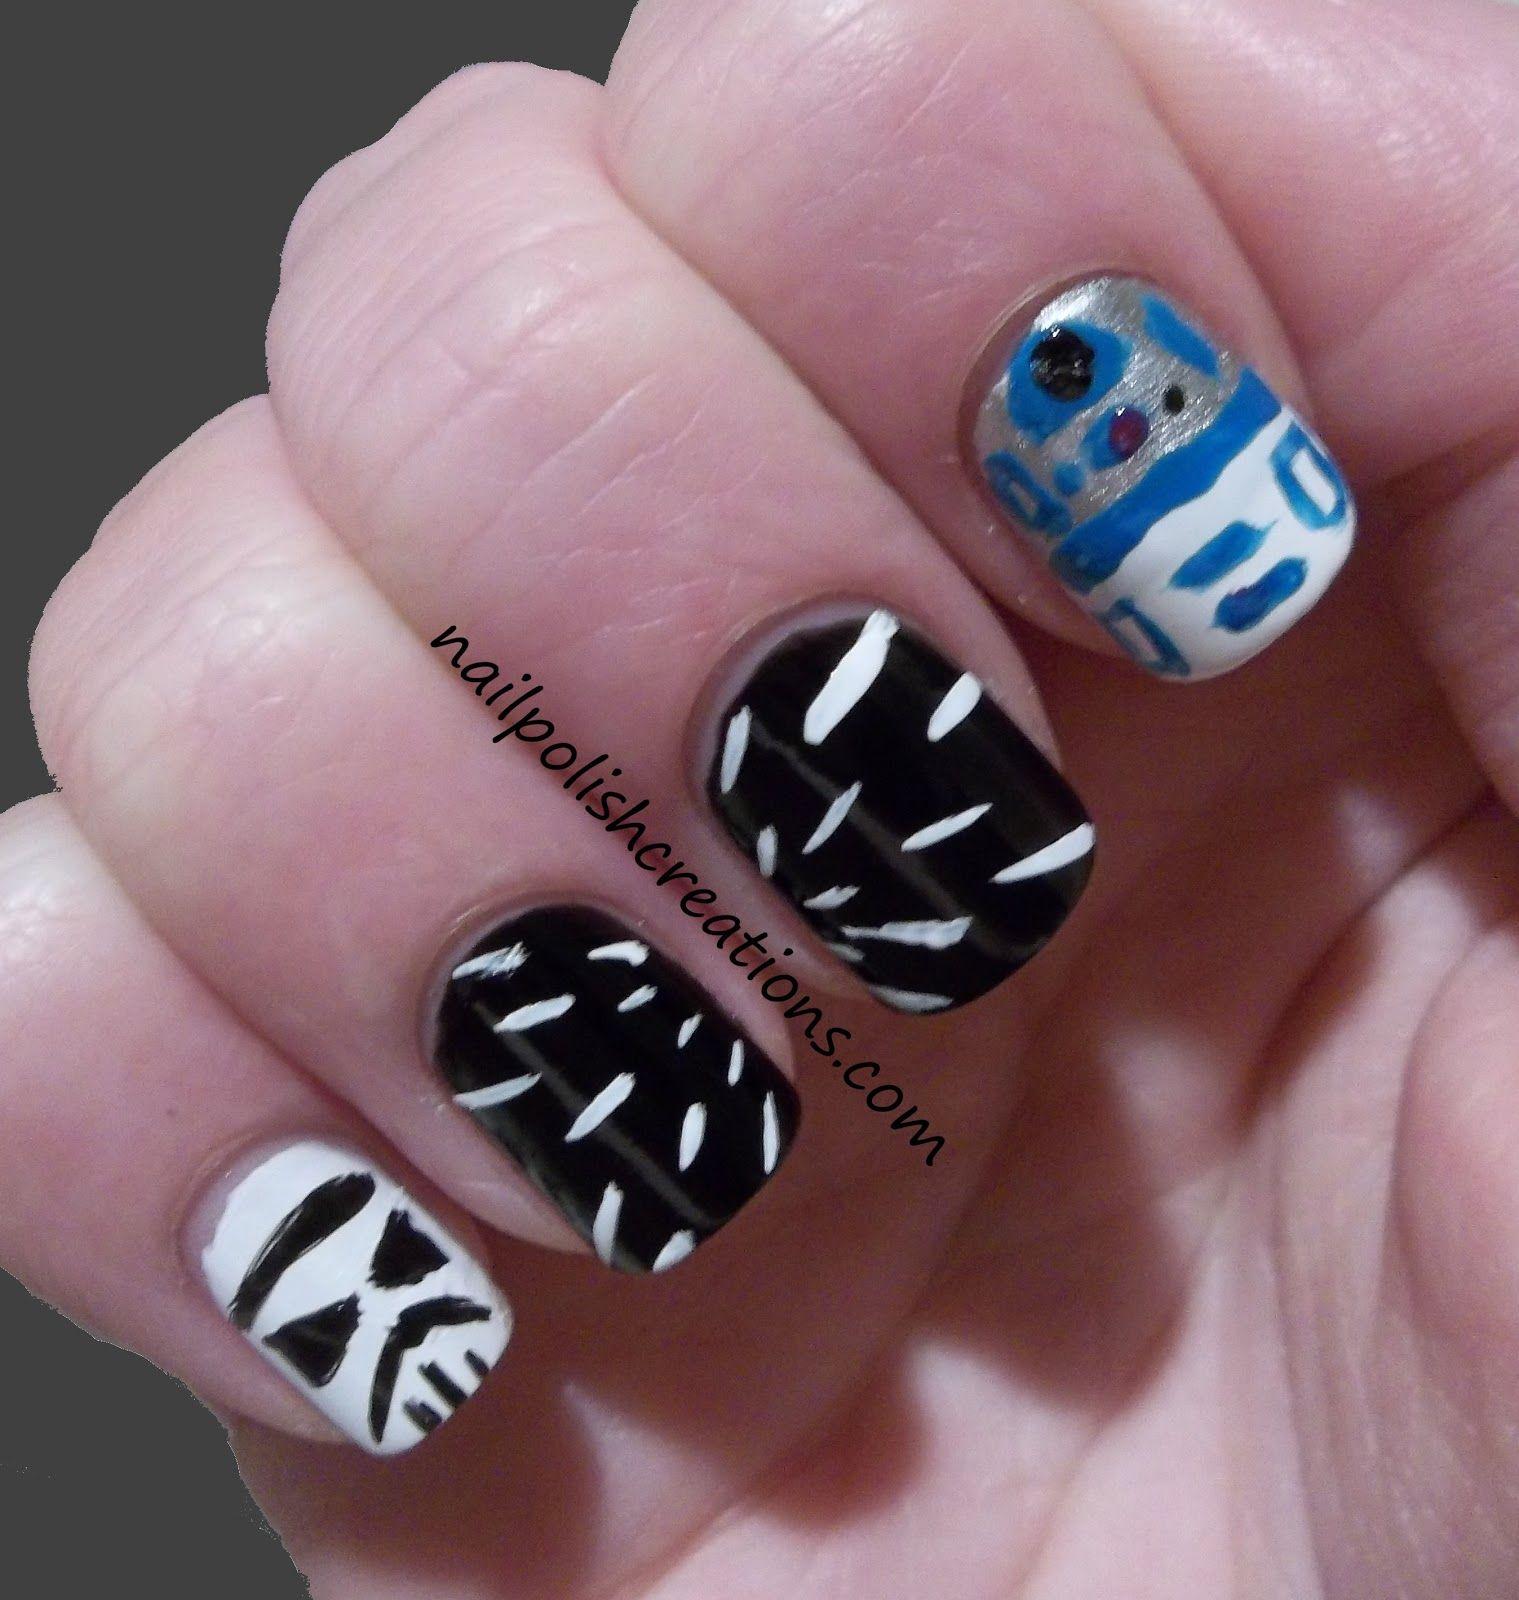 Star Wars nail art | Art of All Sorts | Pinterest | Star wars nails ...